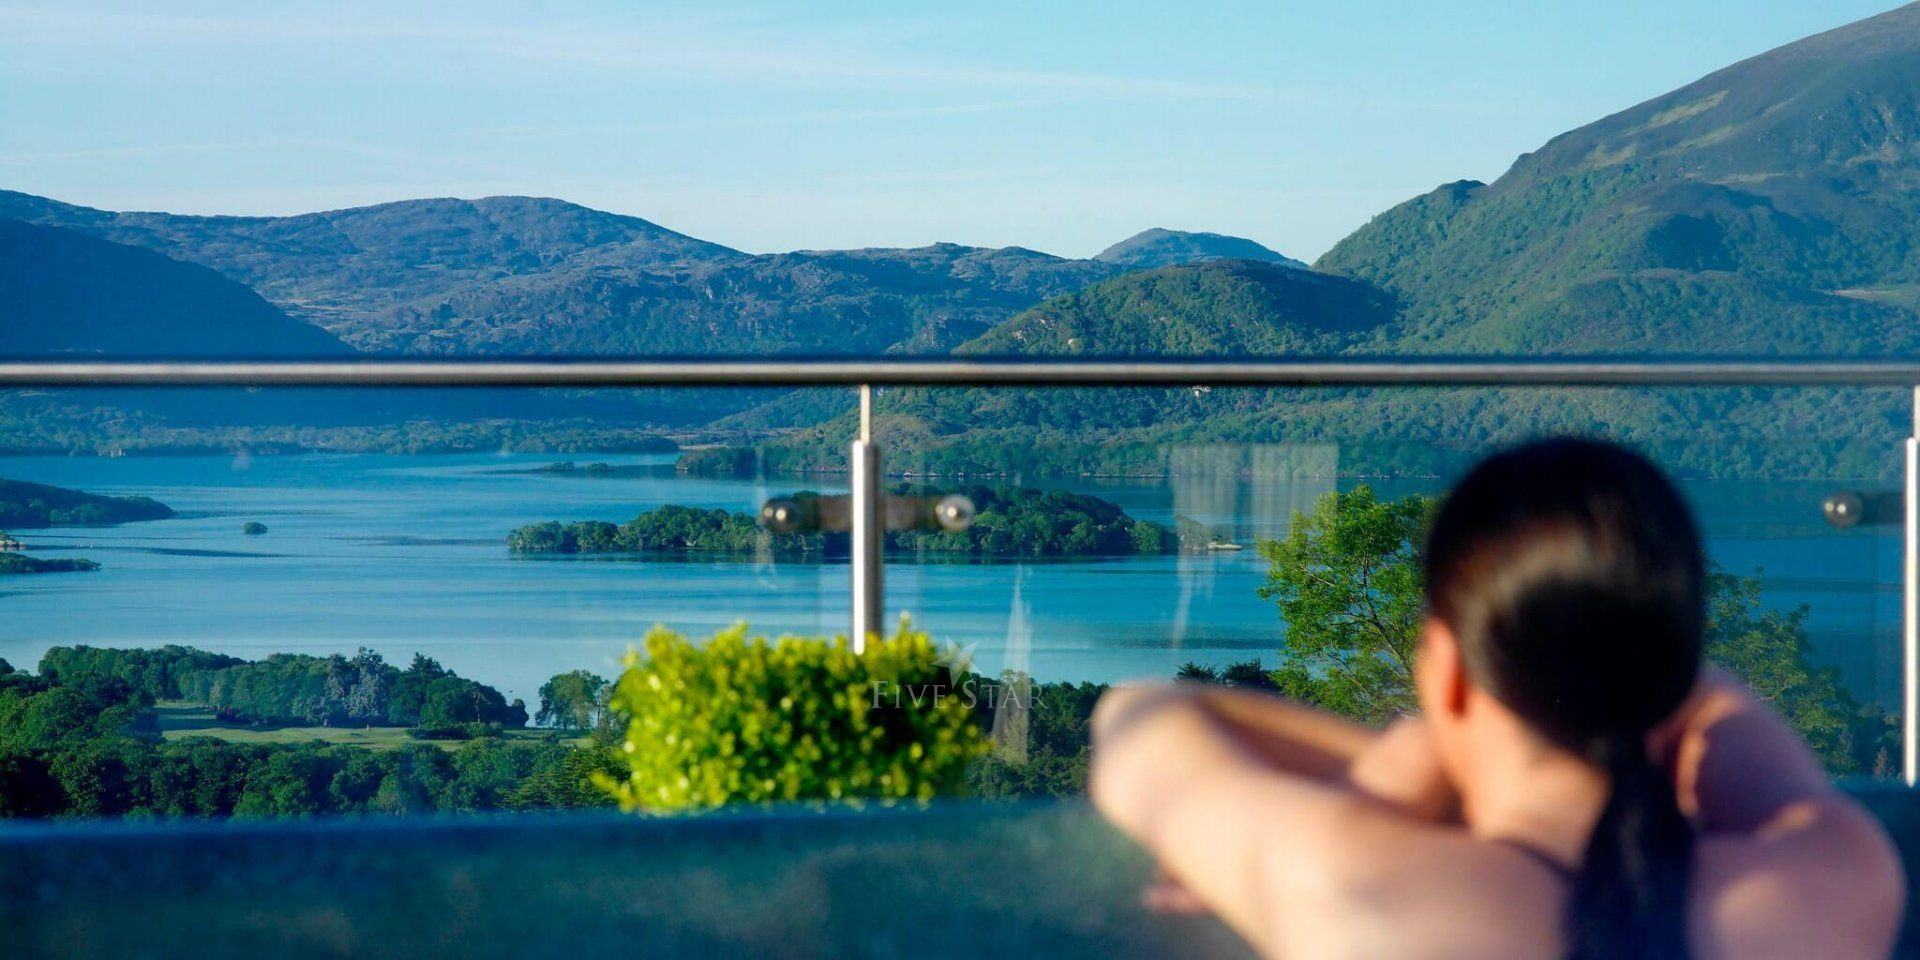 Aghadoe heights hotel 5 star hotel killarney - Lake hotel killarney swimming pool ...